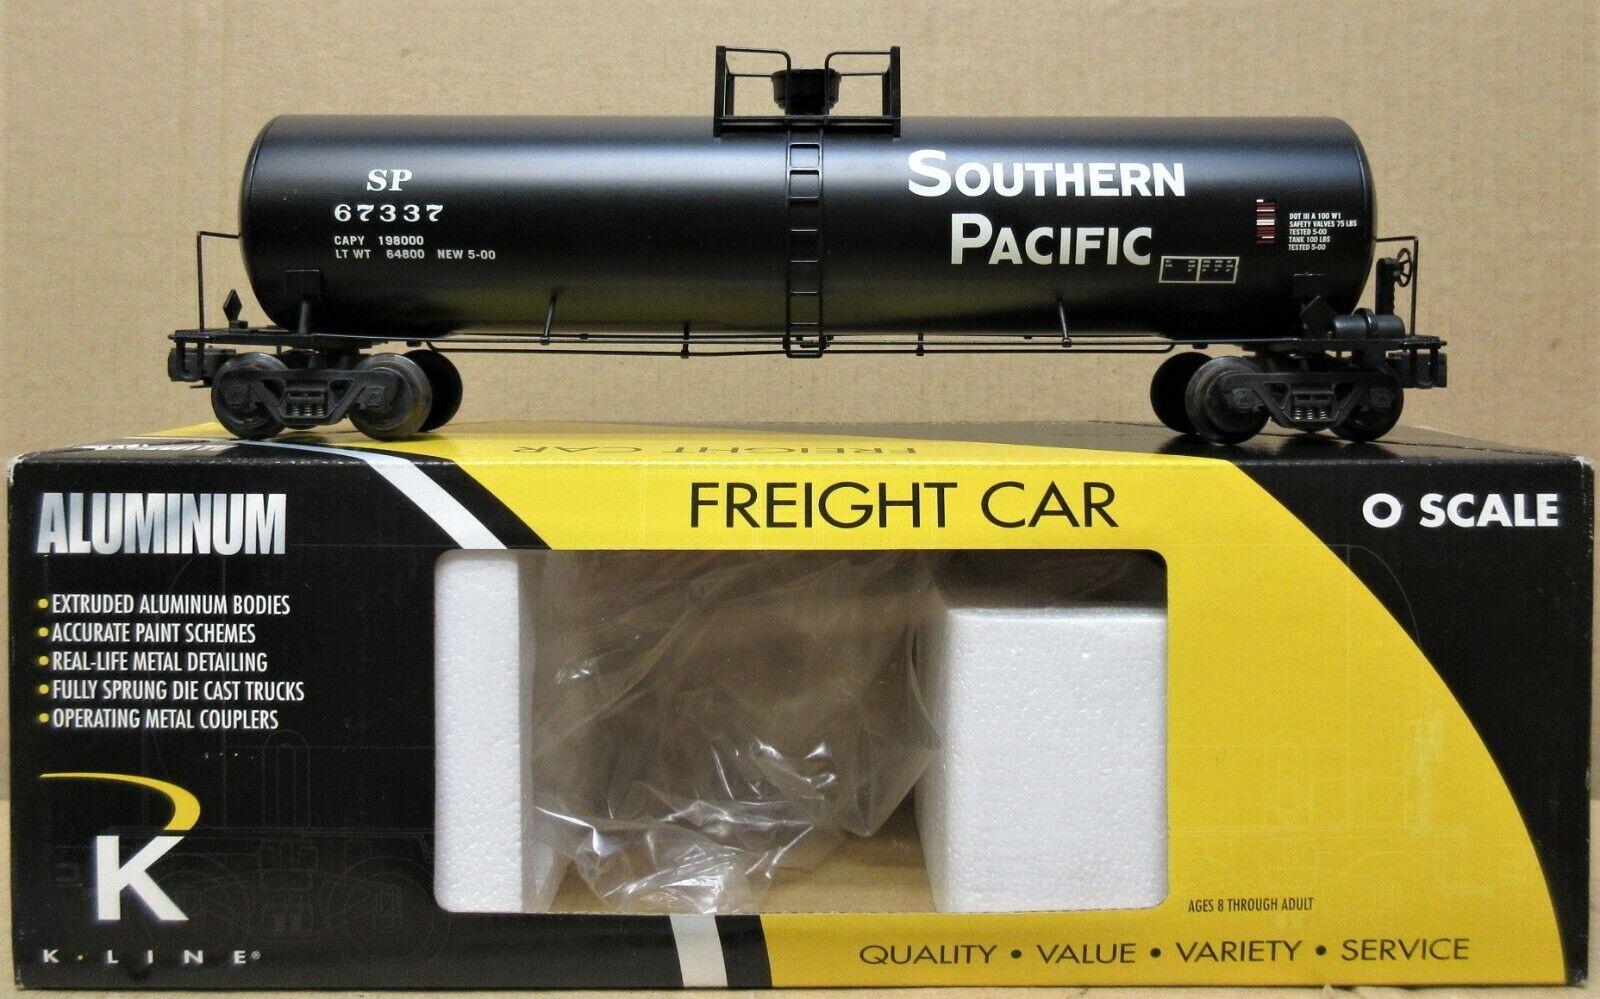 KLine K63342031 SPSouthern Pacific Aluminum Tank auto OGauge USED